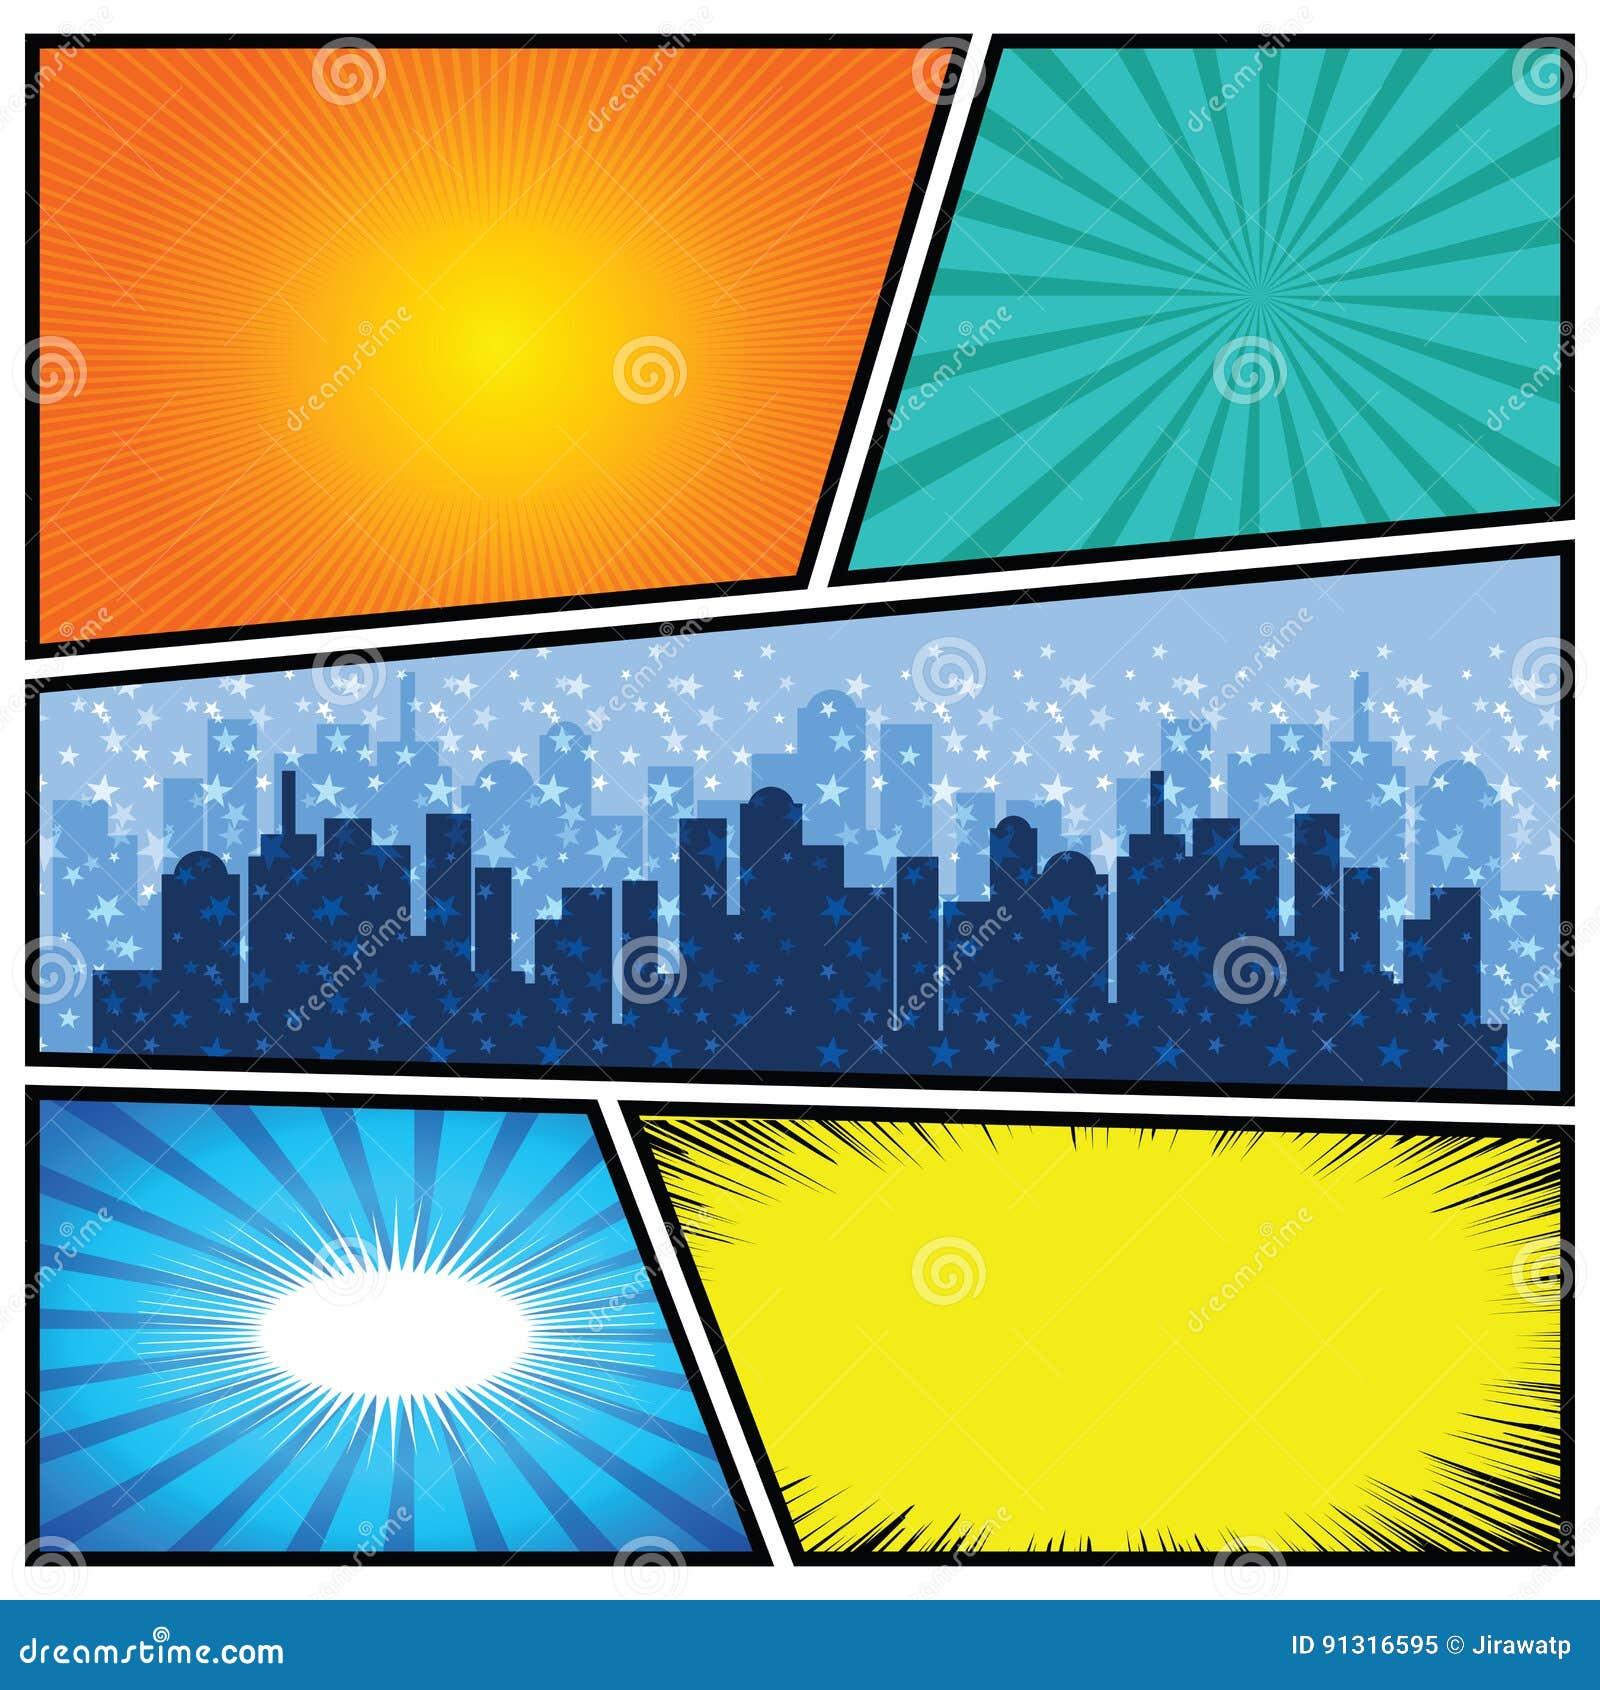 comic book template powerpoint - comics template vector retro comic book speech bubbles